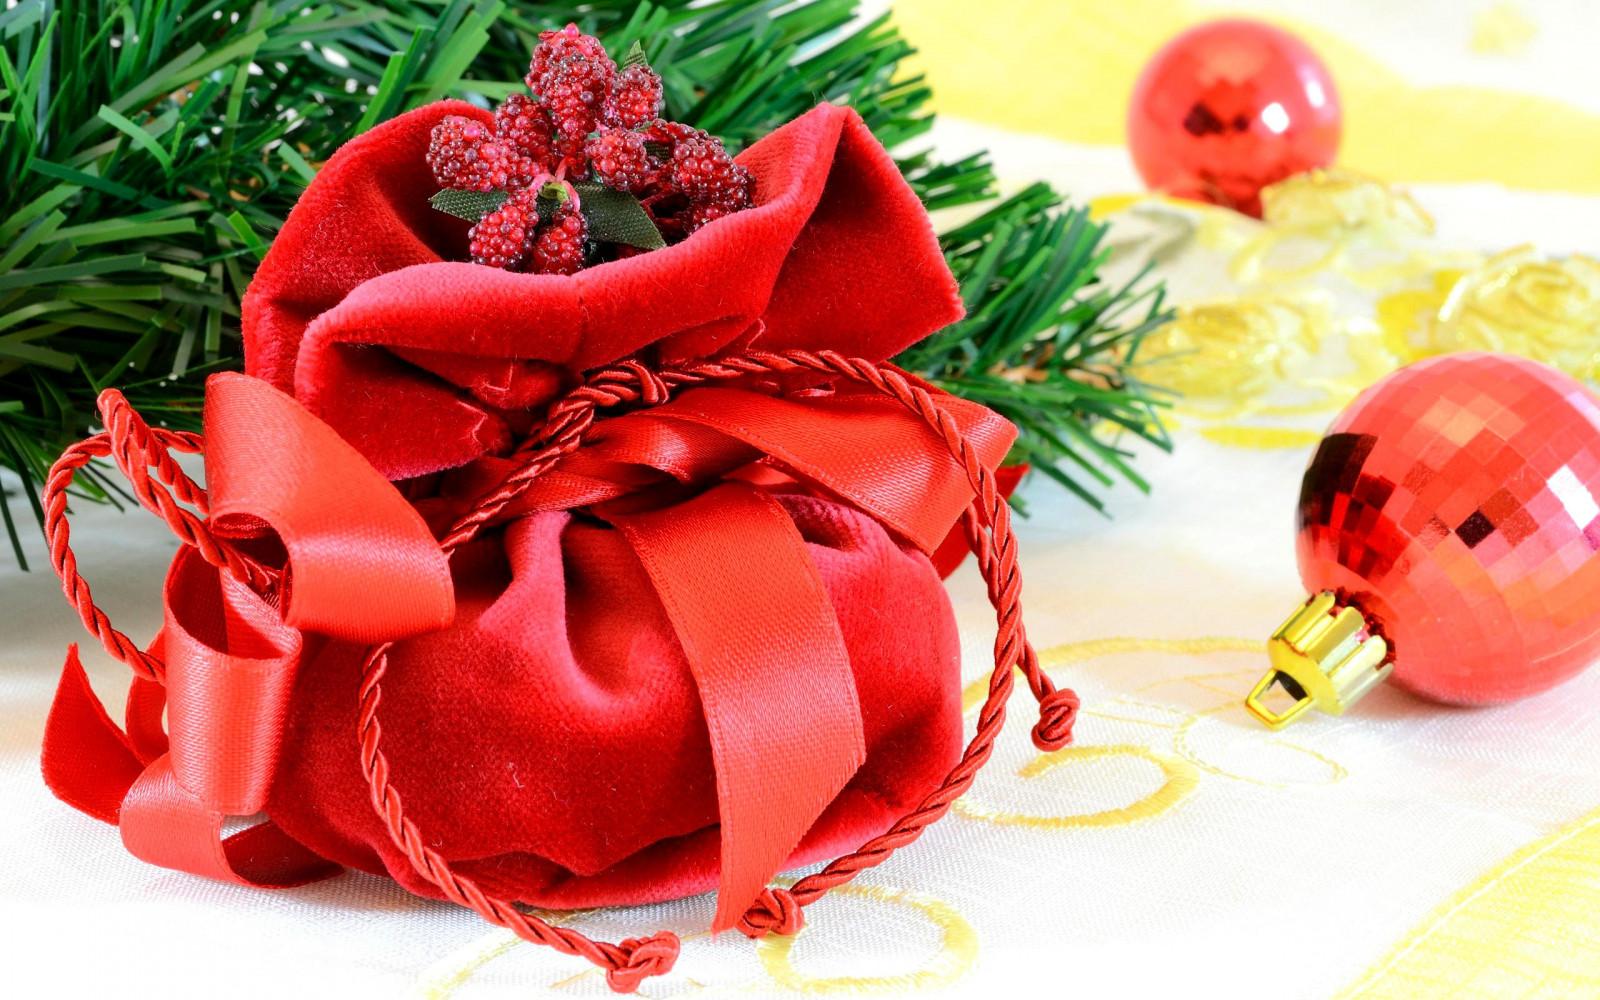 Wallpaper : leaves, rose, Christmas ornaments, New Year, bag